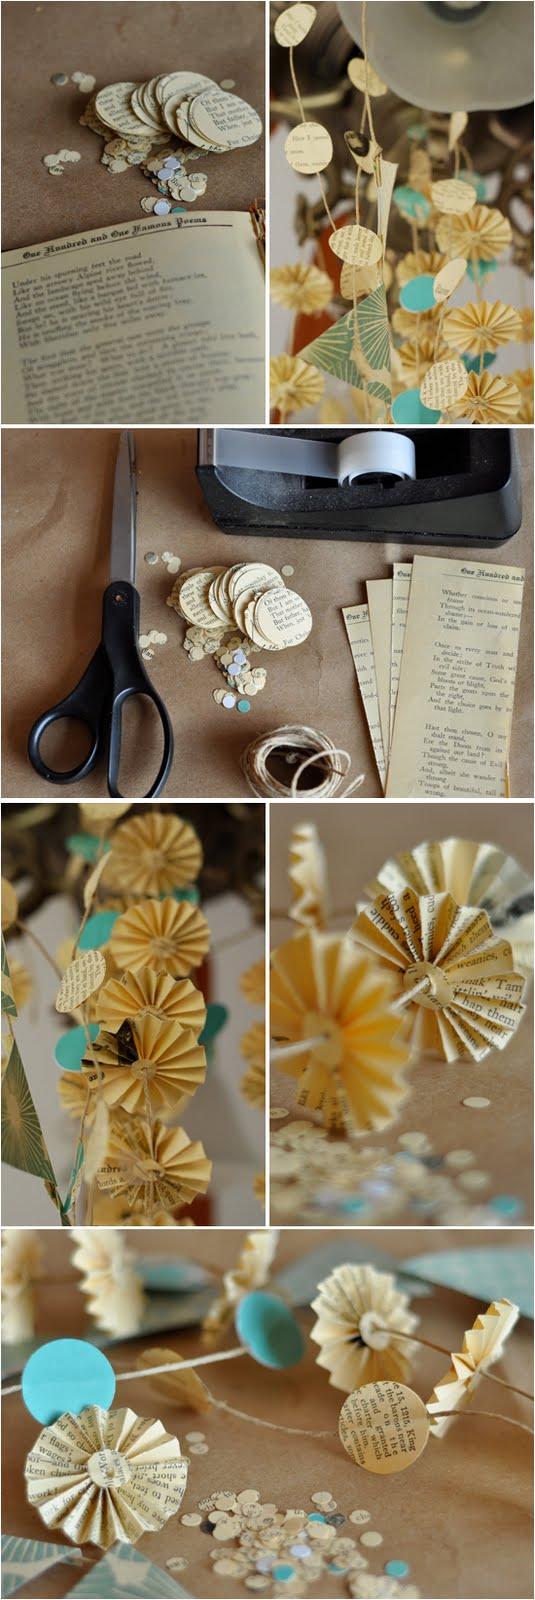 Swanky Blog: DIY Paper Pinwheels & Garlands